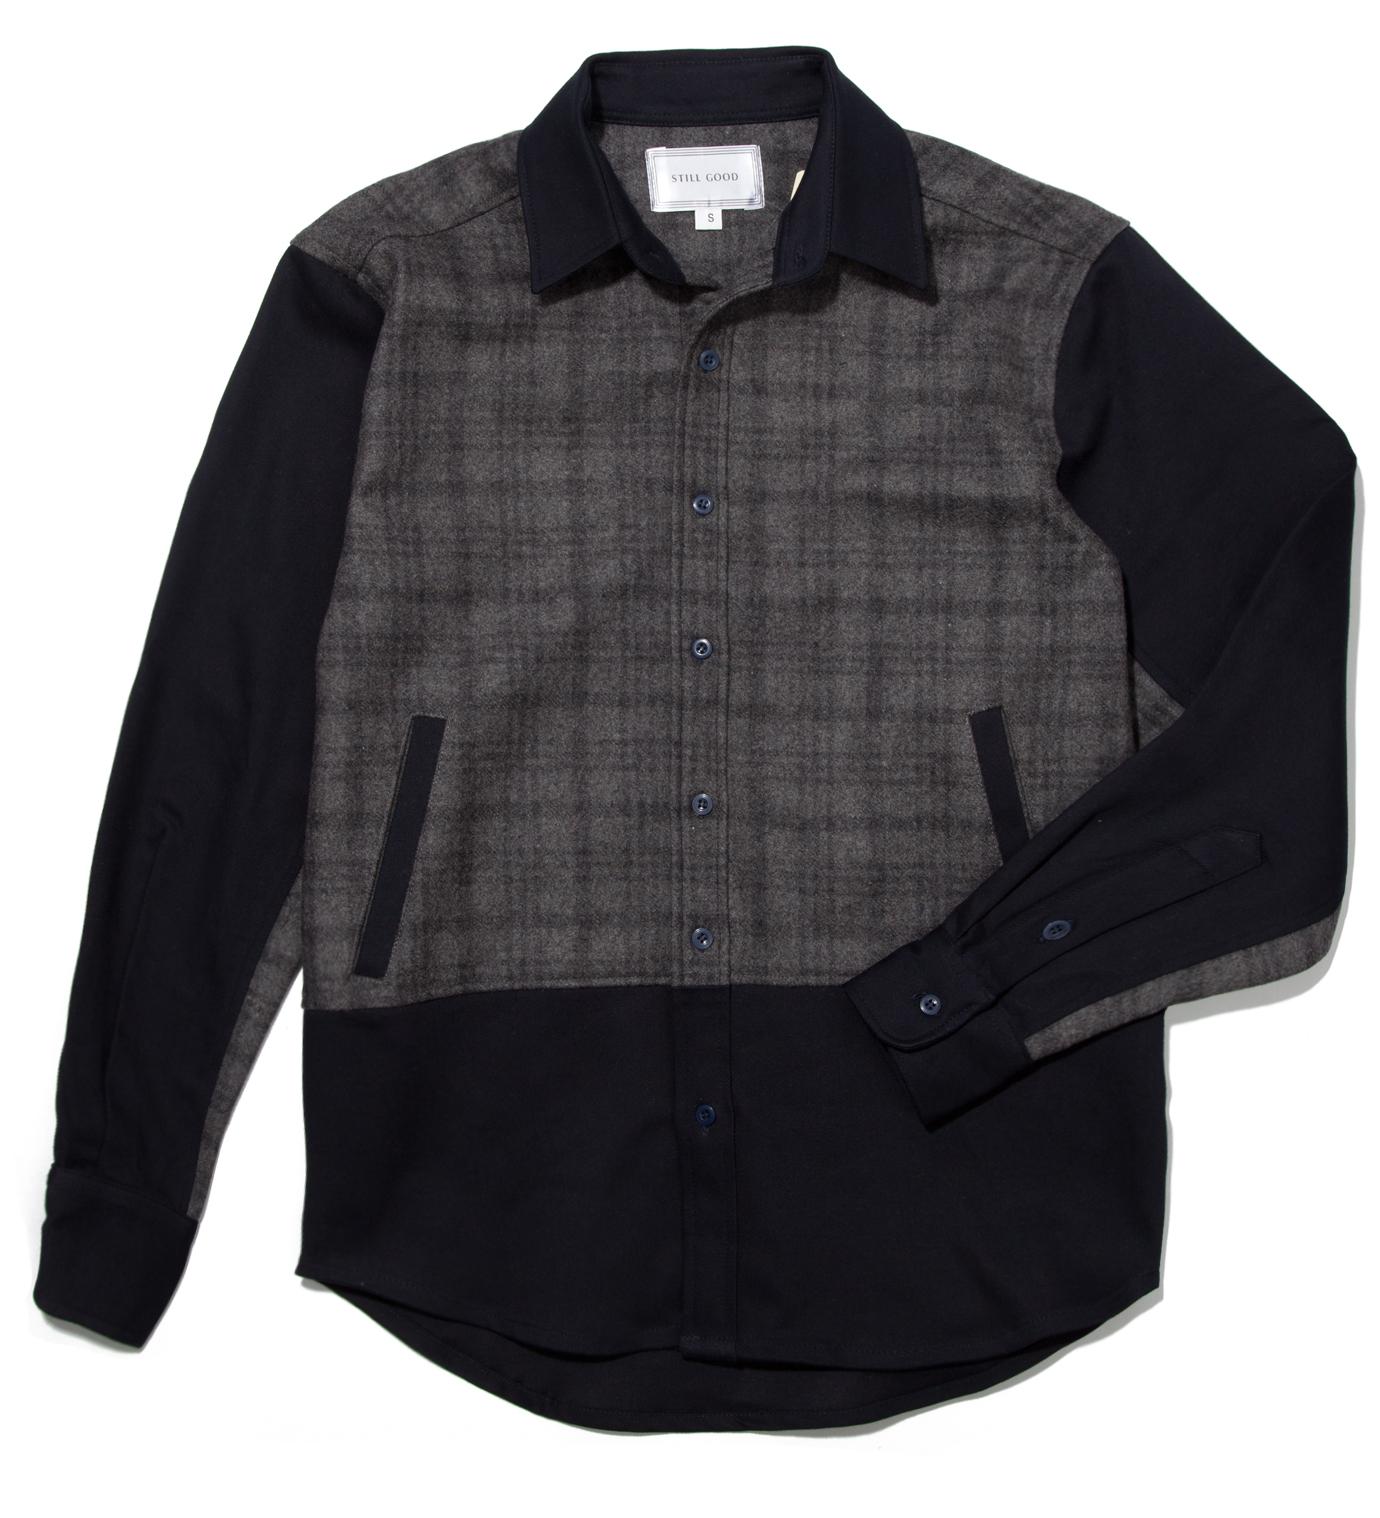 Still Good Navy and Grey Antithese Shirt